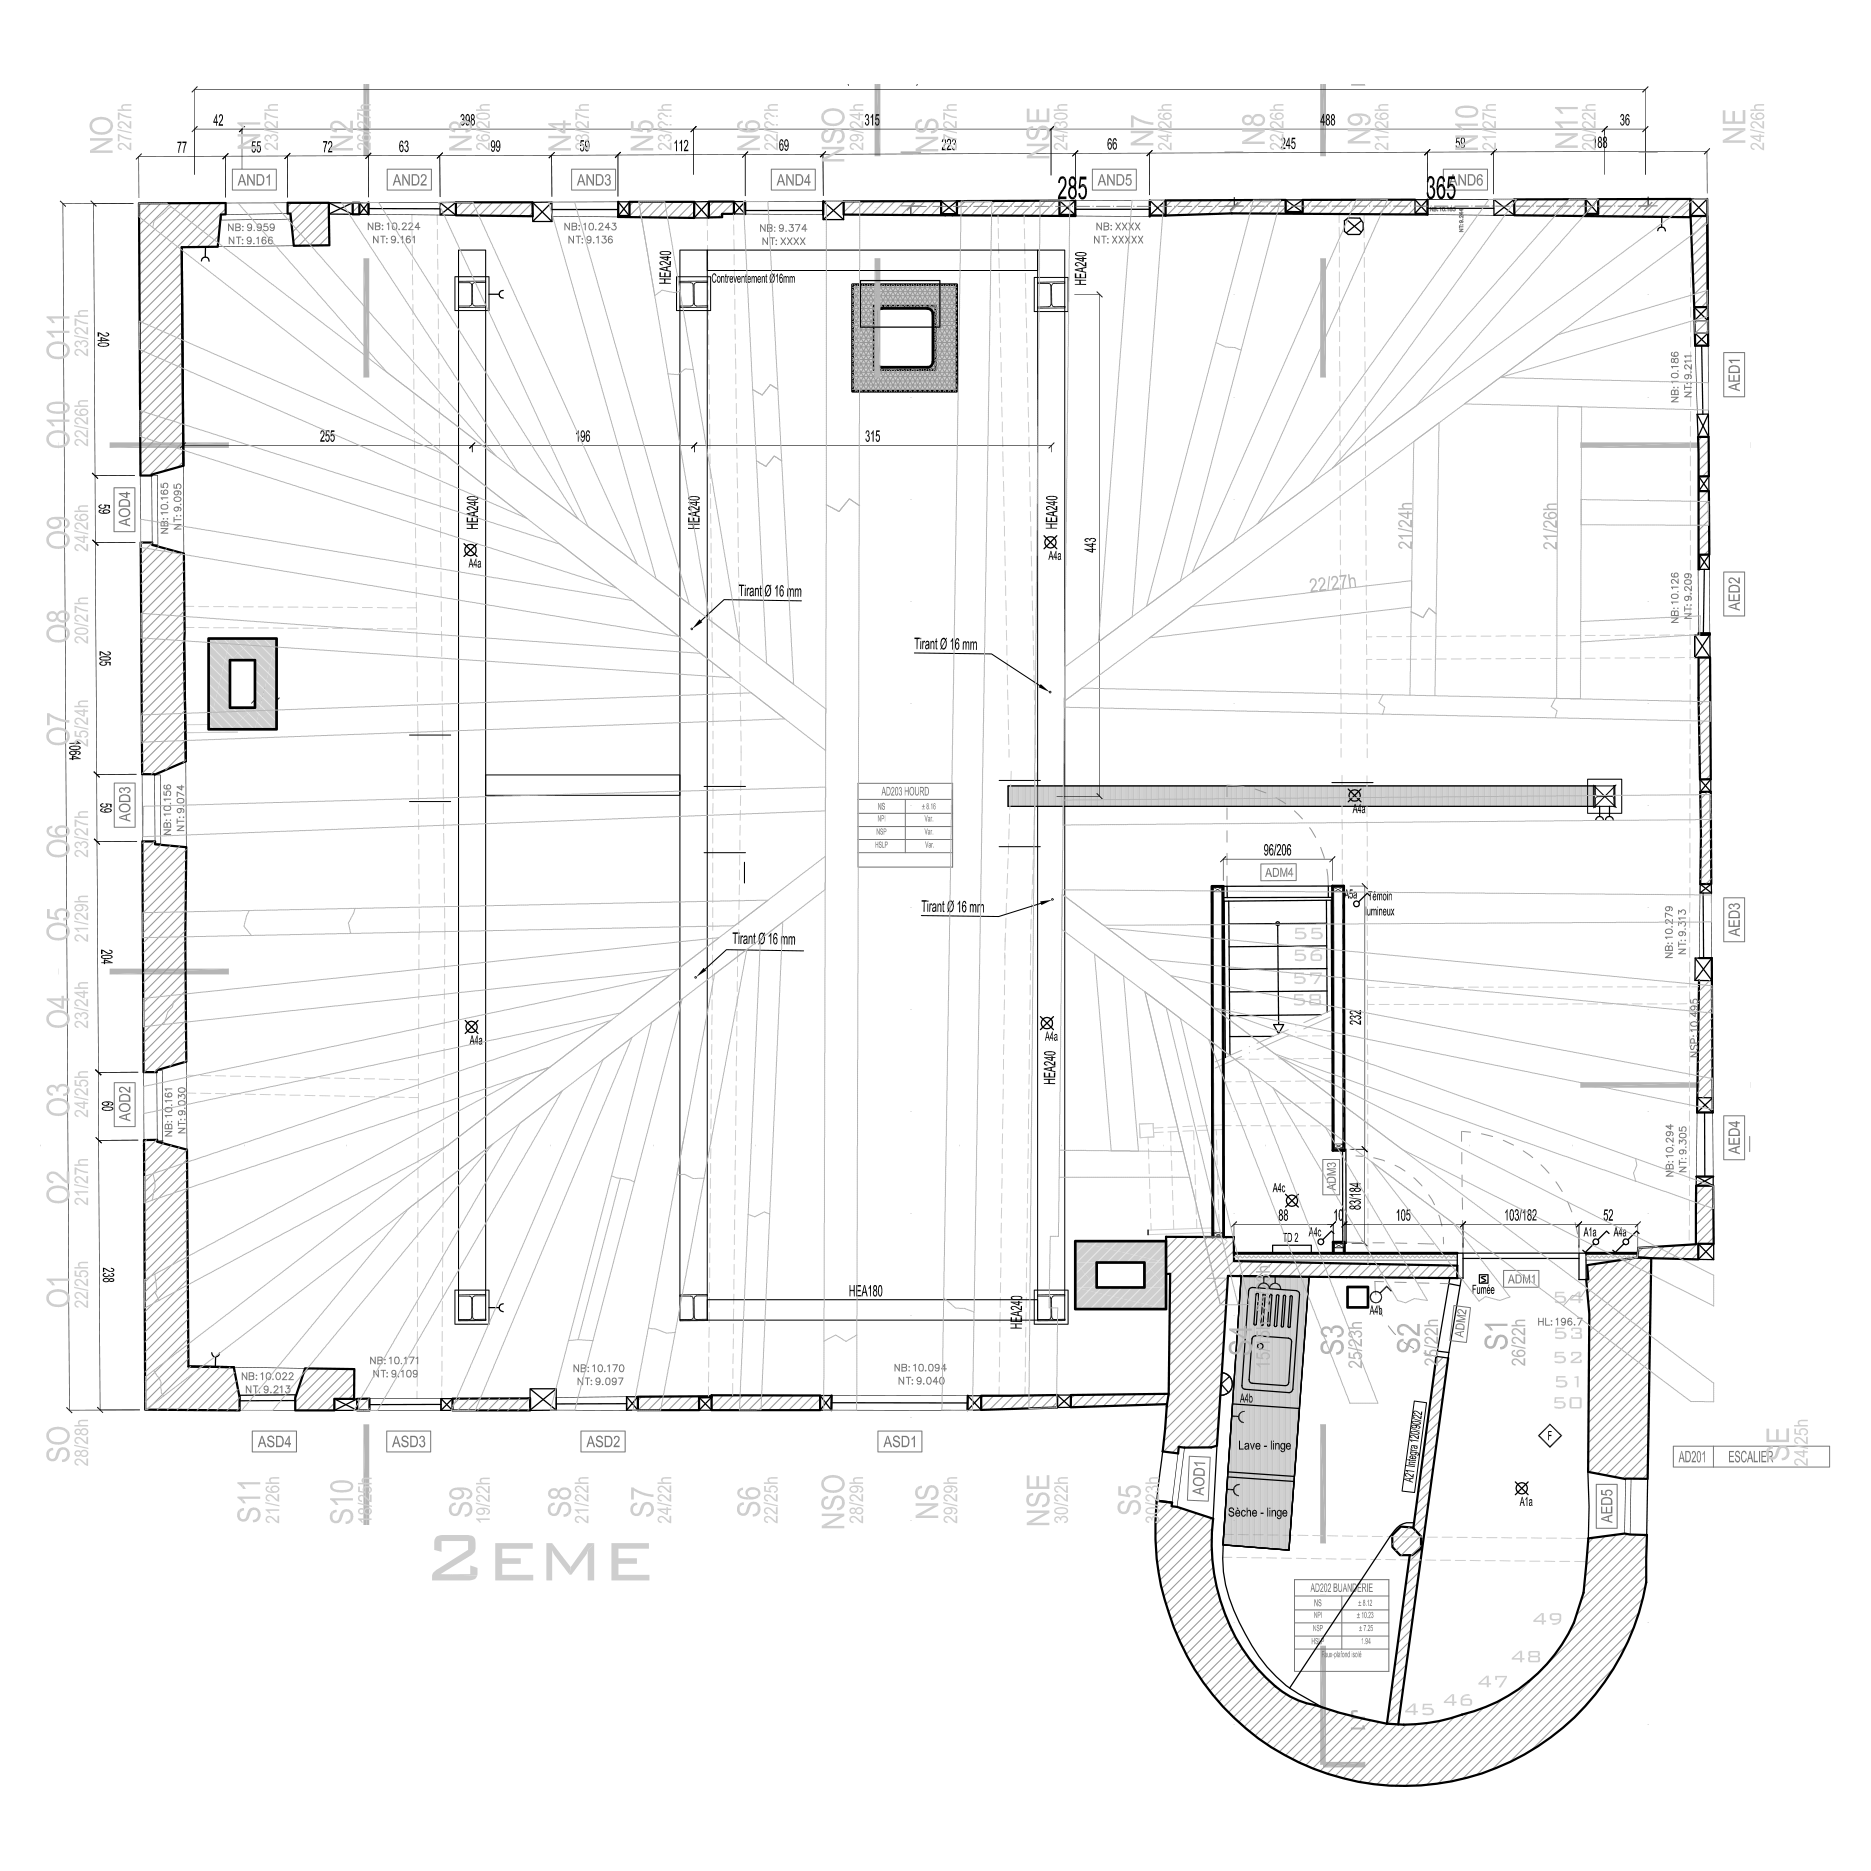 donjon-tweede-etage